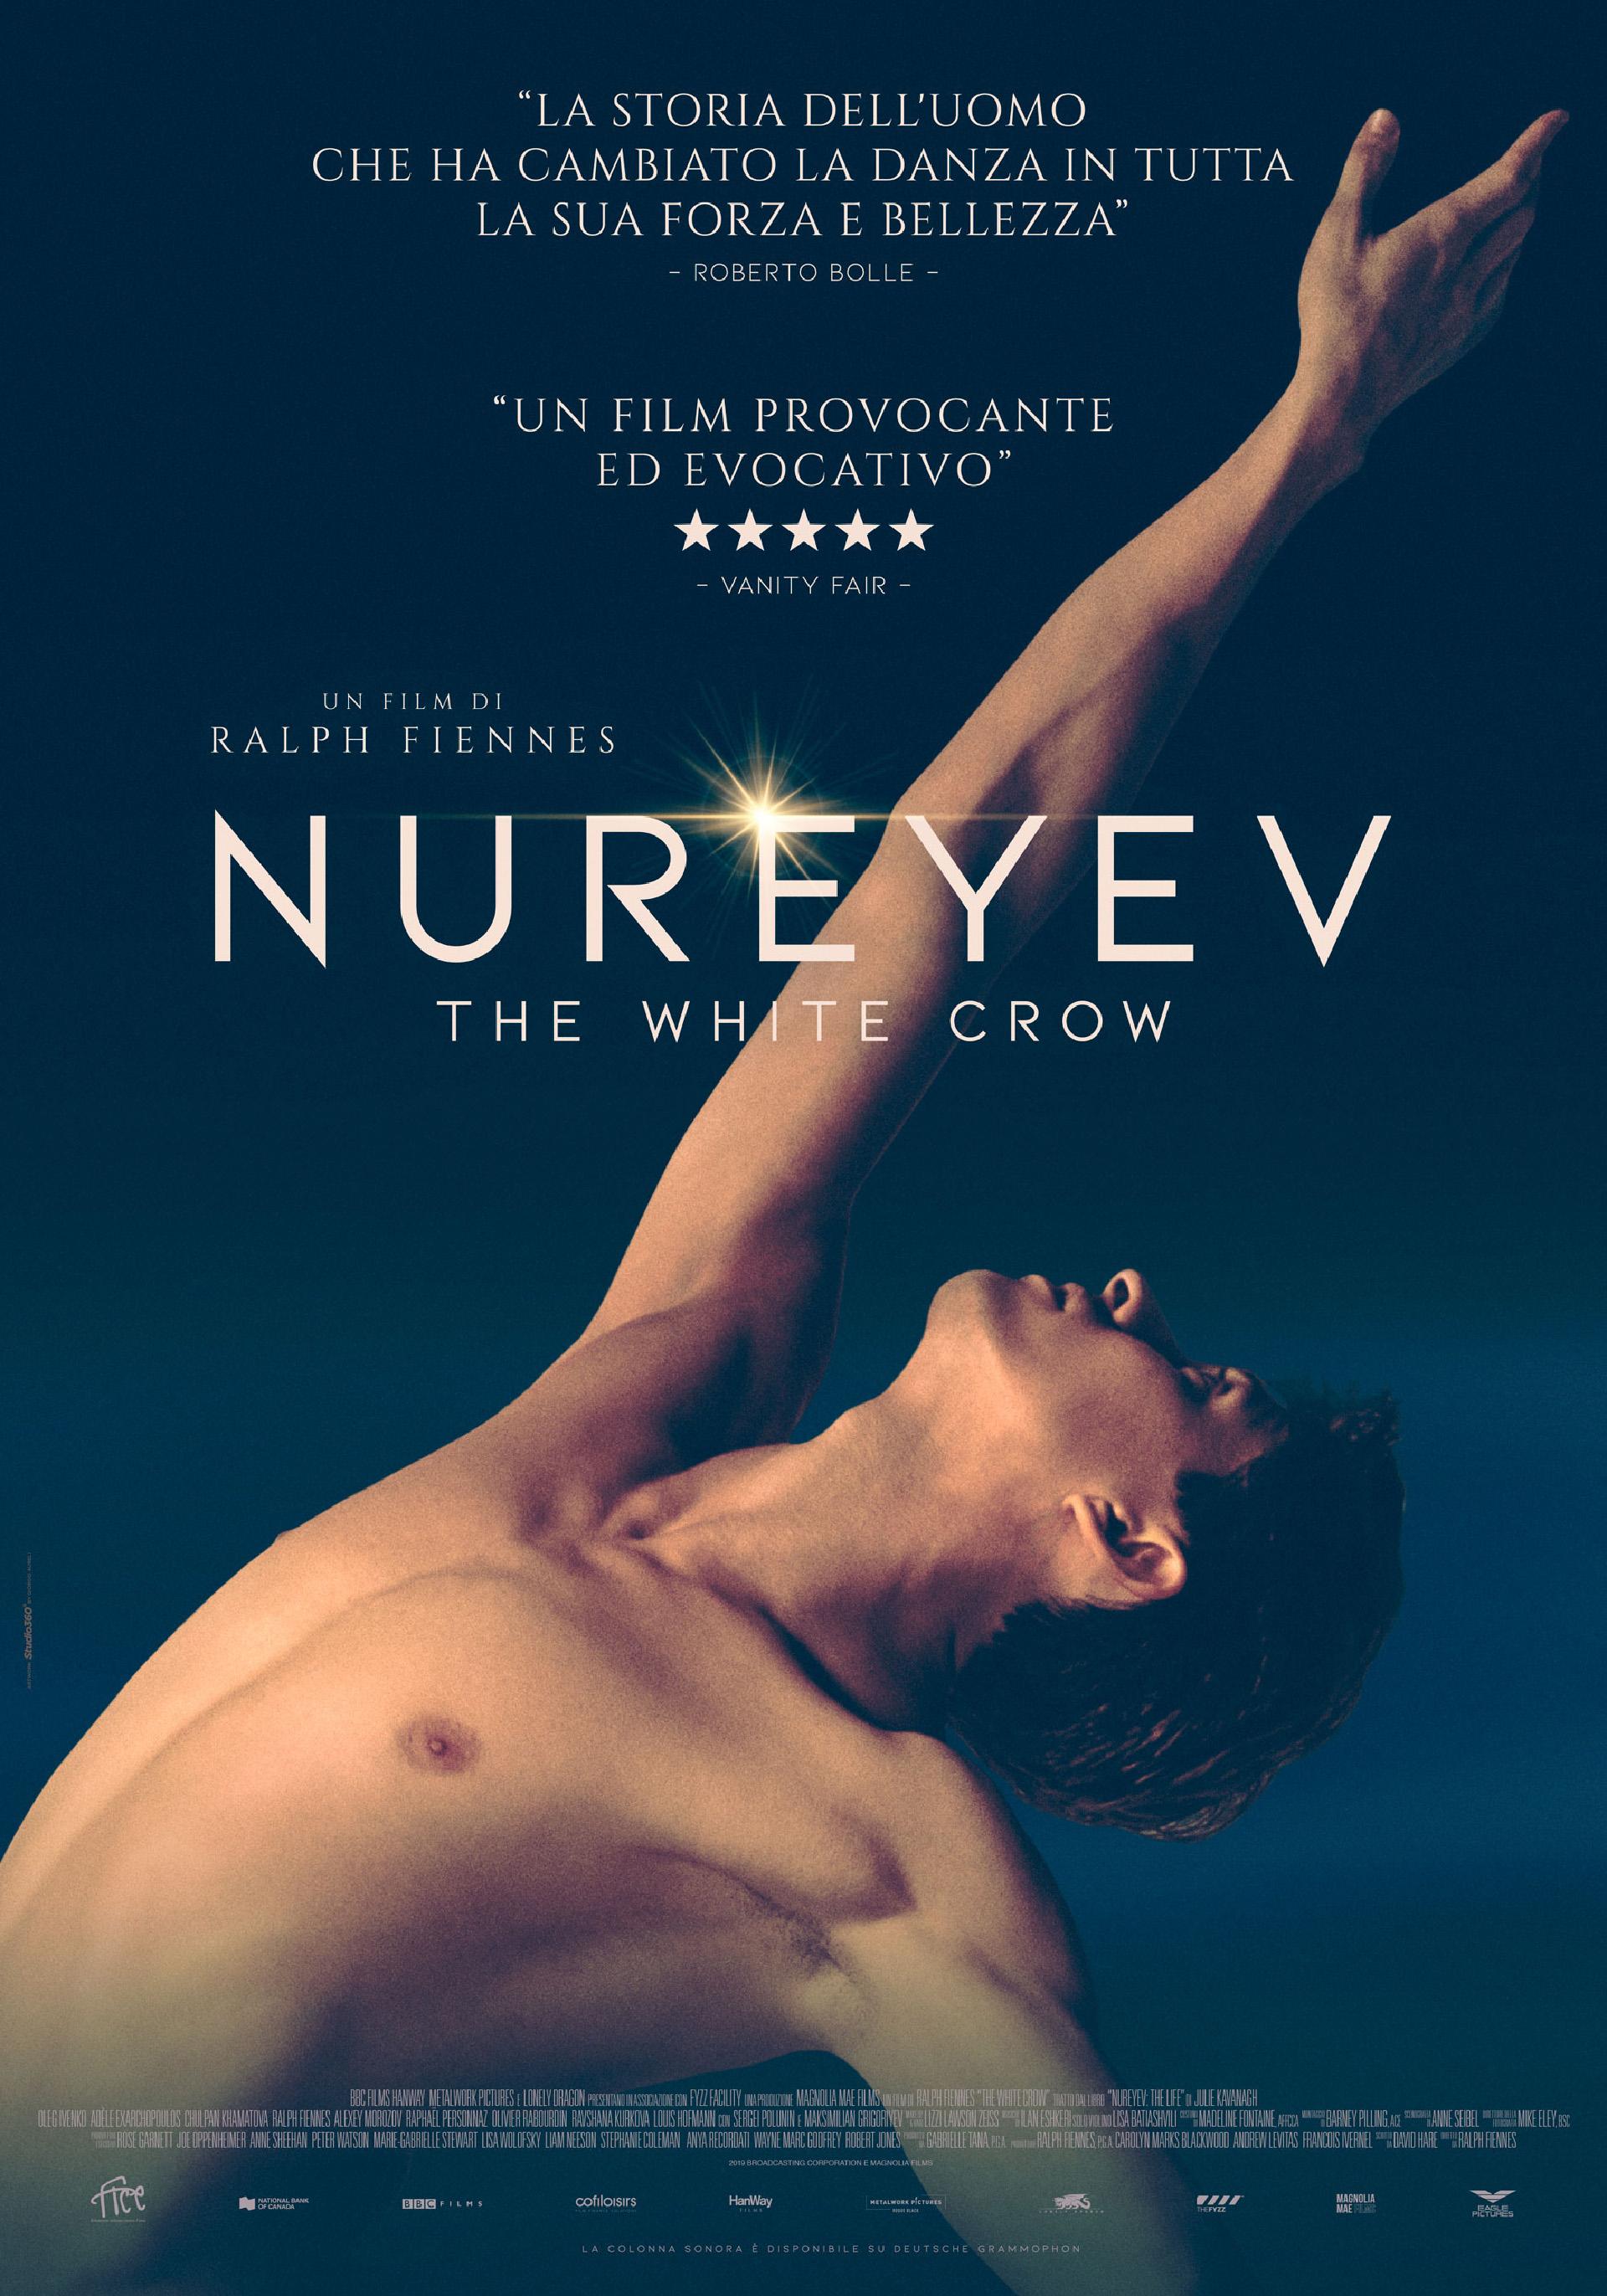 Nureyev - The White Crow, cinematographe.it